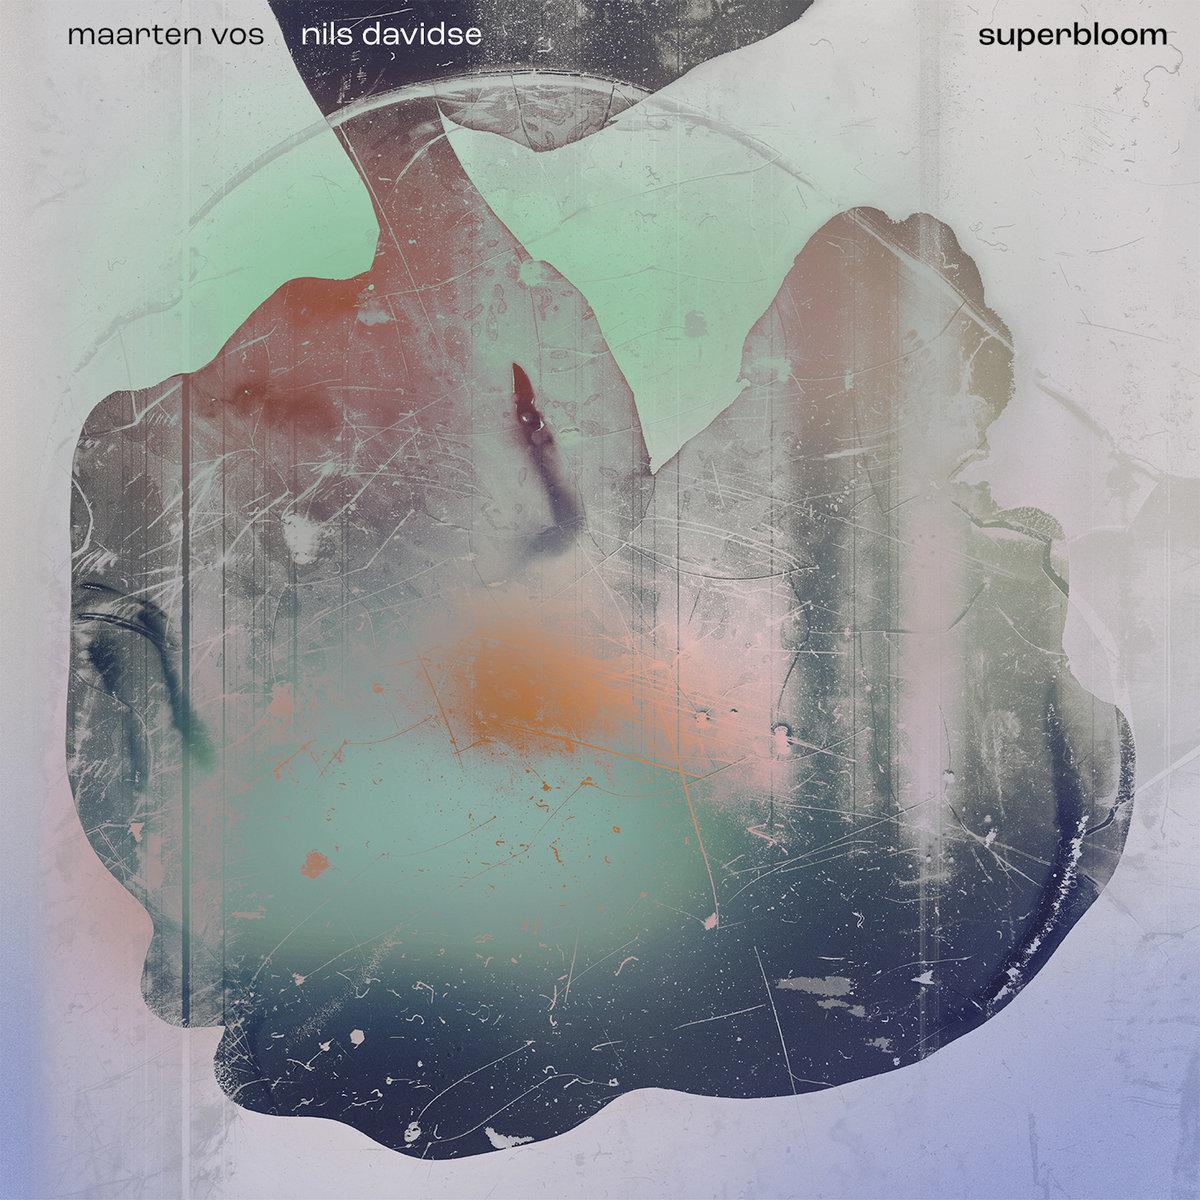 Superbloom, by Maarten Vos & Nils Davidse